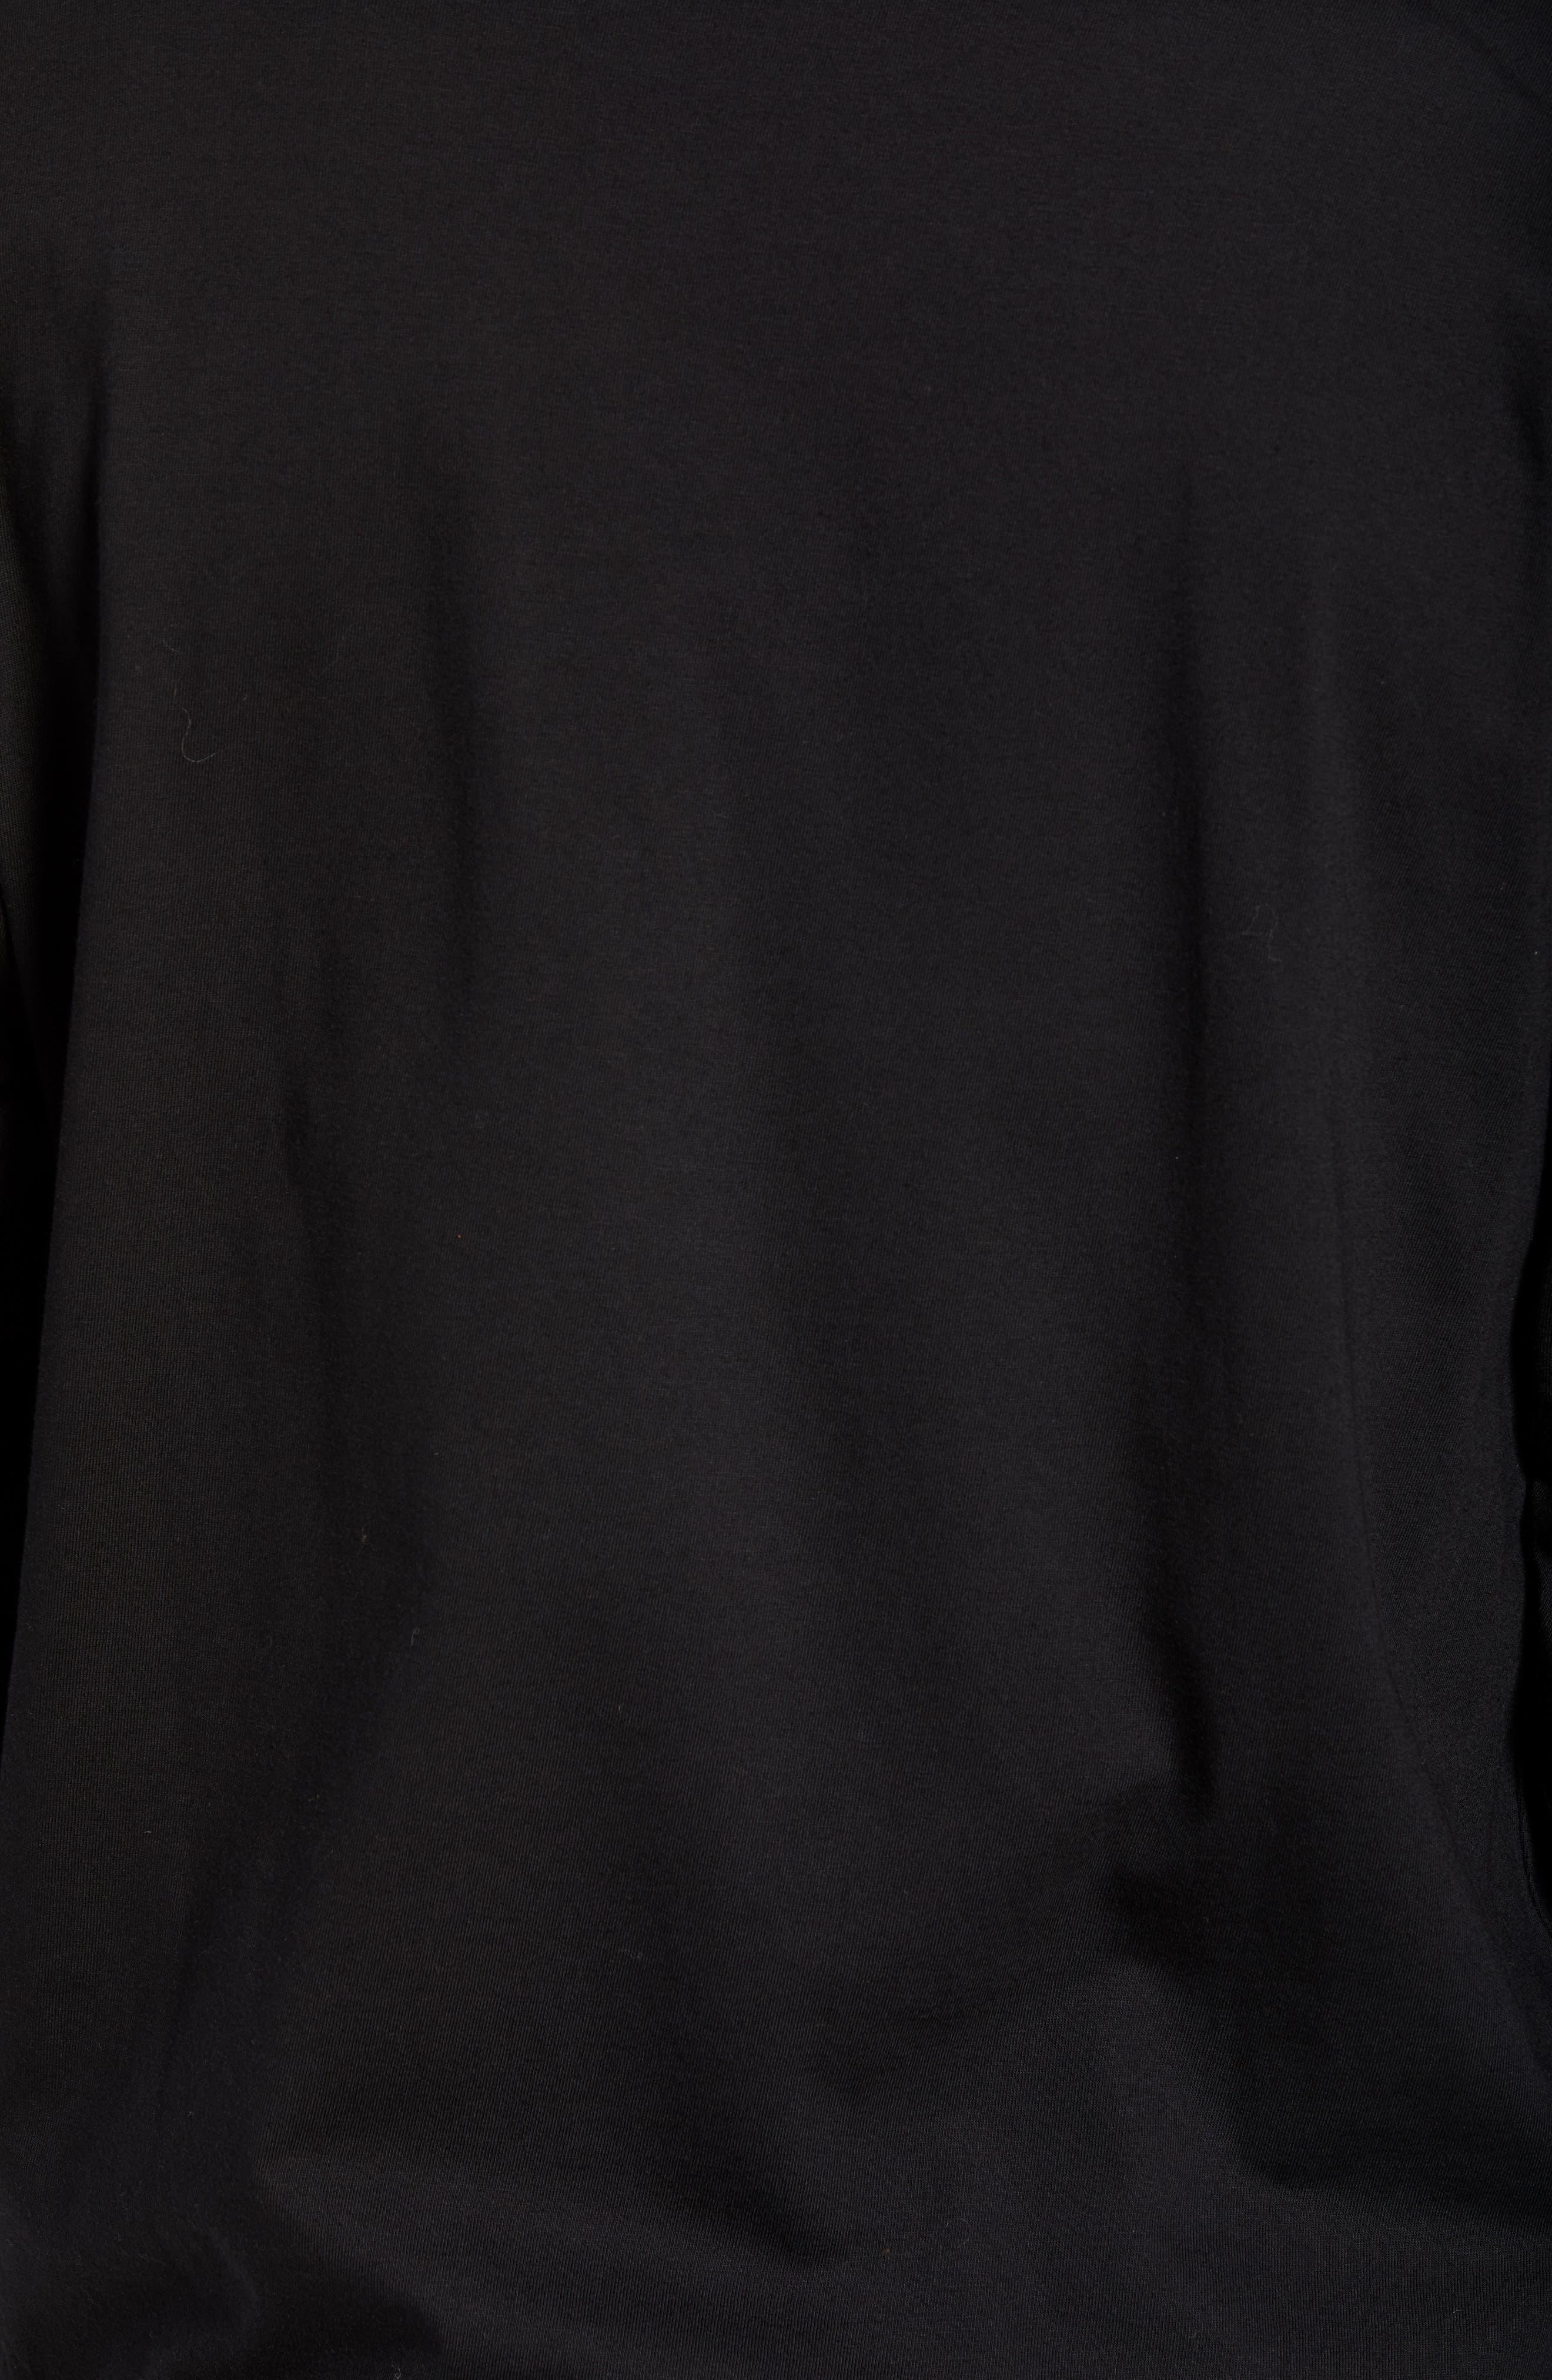 Long Sleeve 1989 T-Shirt,                             Alternate thumbnail 5, color,                             BLACK / WHITE